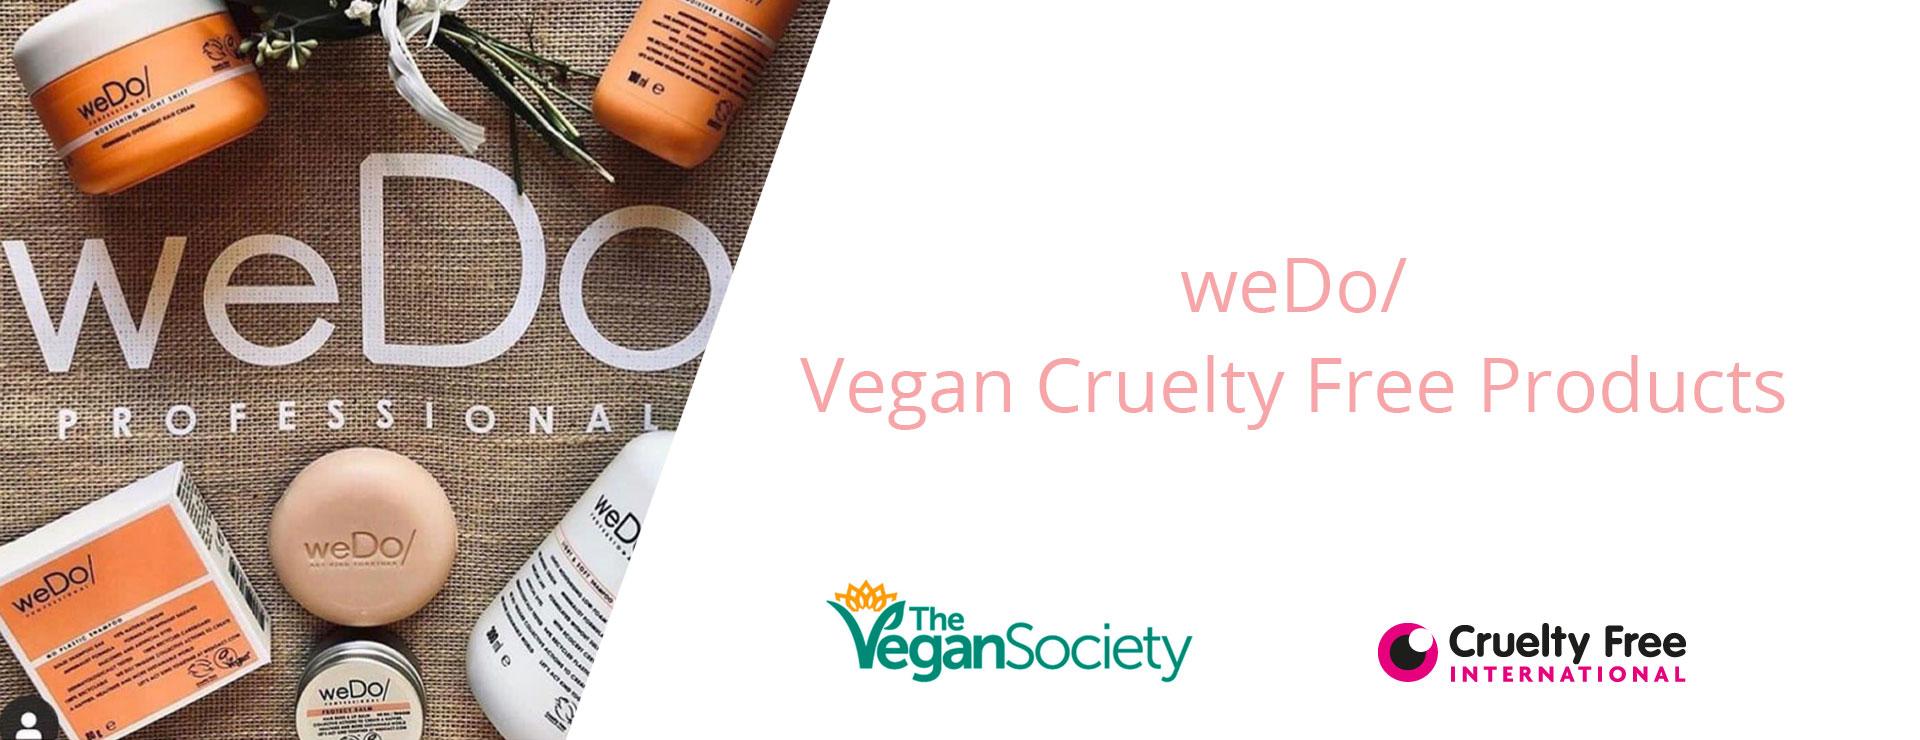 weDo Vegan Cruelty Free Products 2